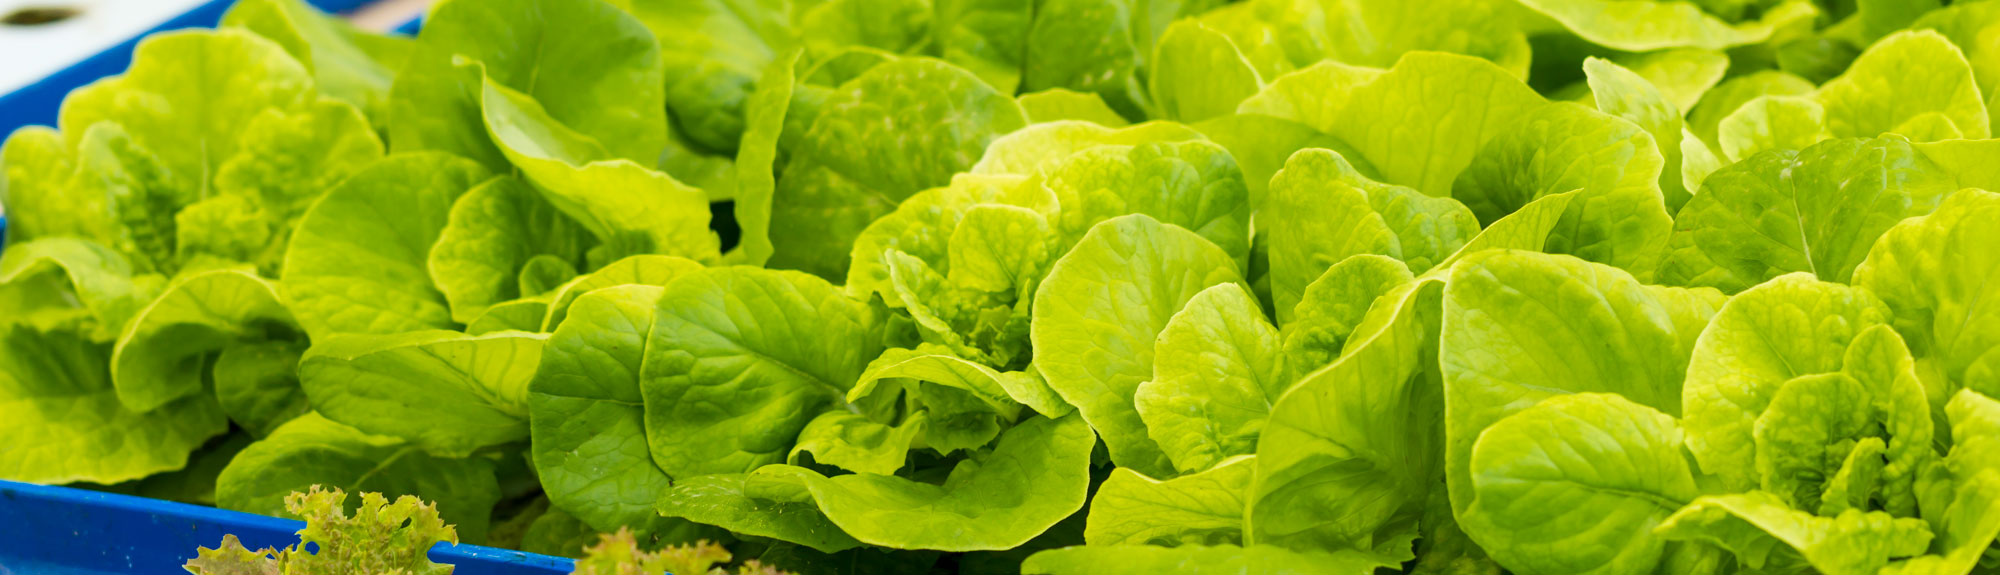 Aquaponic lettuce at Robin Hills Farm